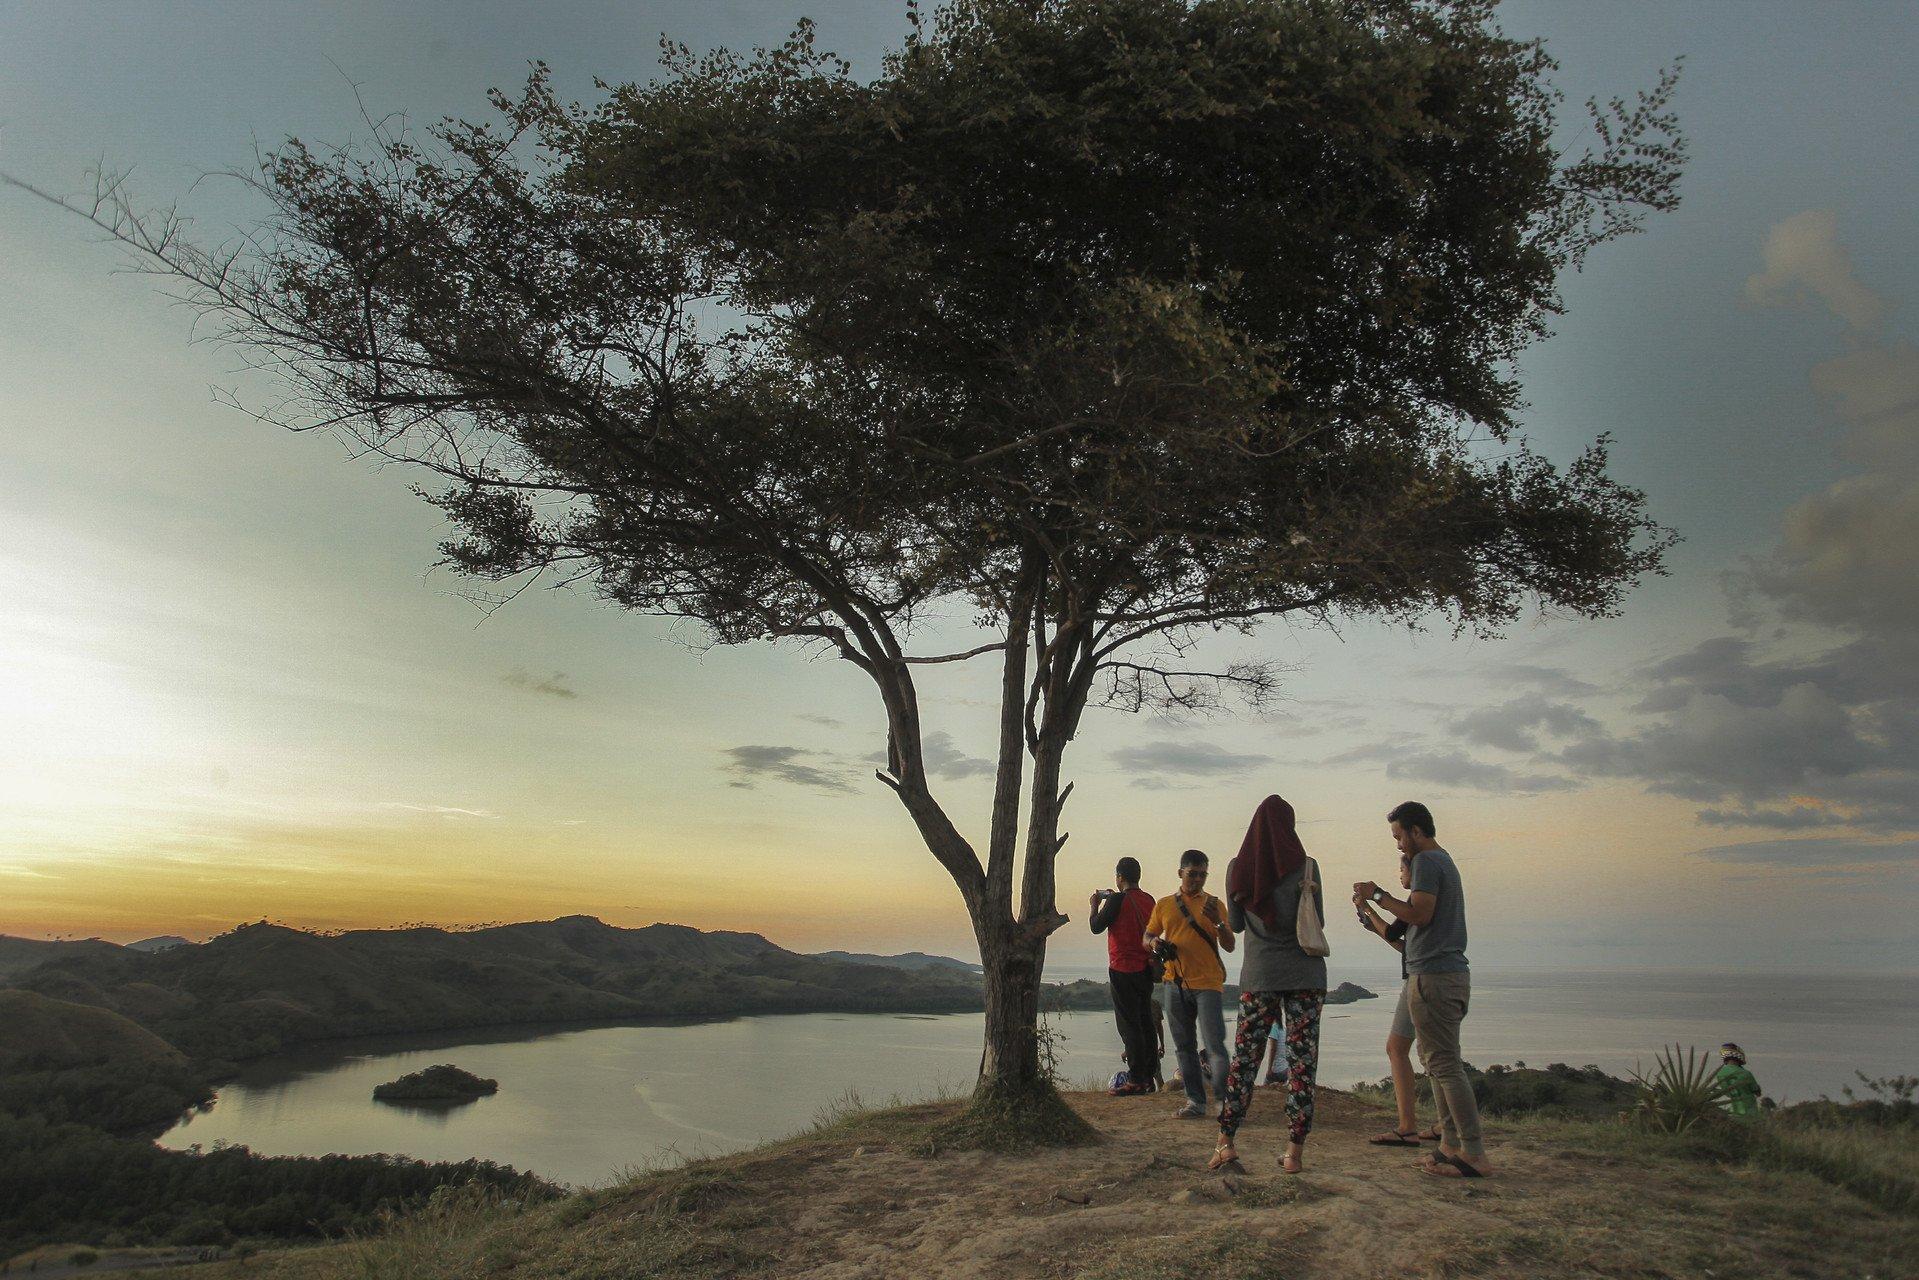 Edsus Pariwisata_Labuan Bajo, Nusa Tenggara Timur